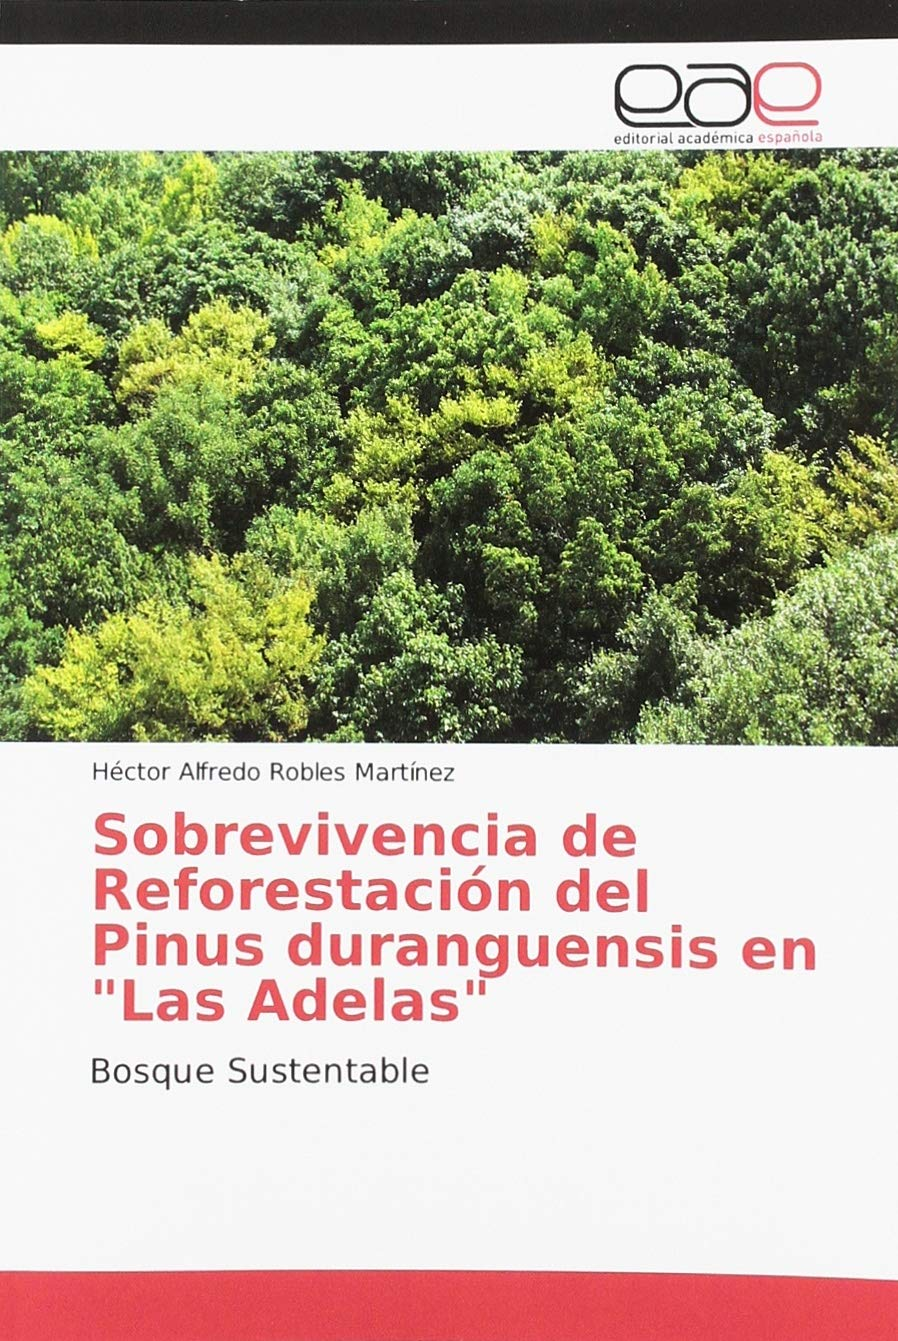 Sobrevivencia de Reforestación del Pinus duranguensis en